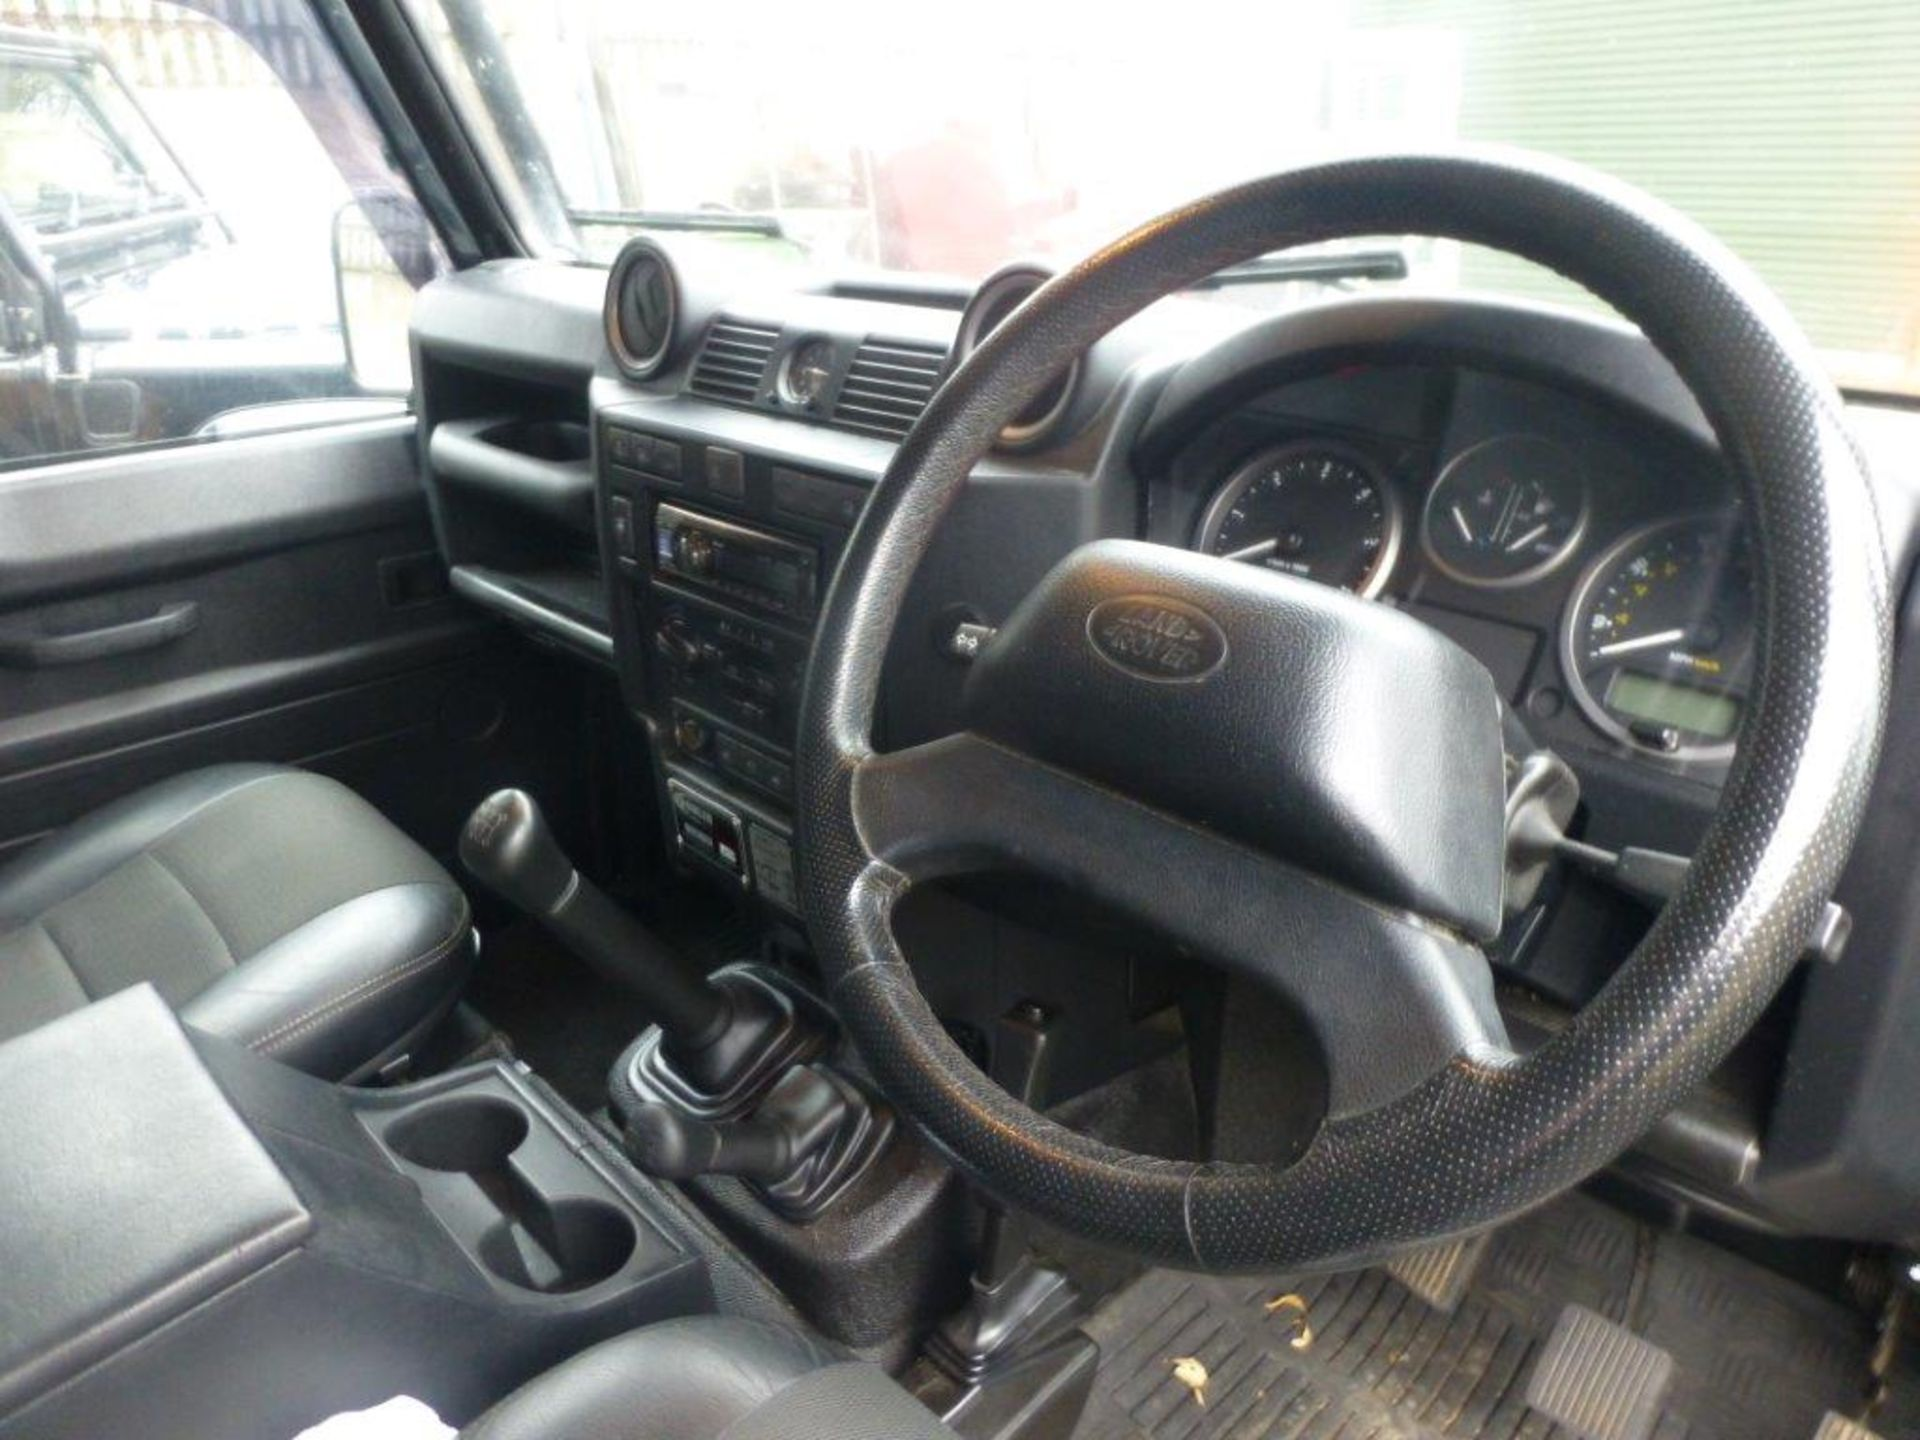 Land Rover Defender 110 XS Bowler double cab pickup TDCi (2.2). Reg no. FN15 LBK. Reg. date 23/03/ - Image 7 of 12